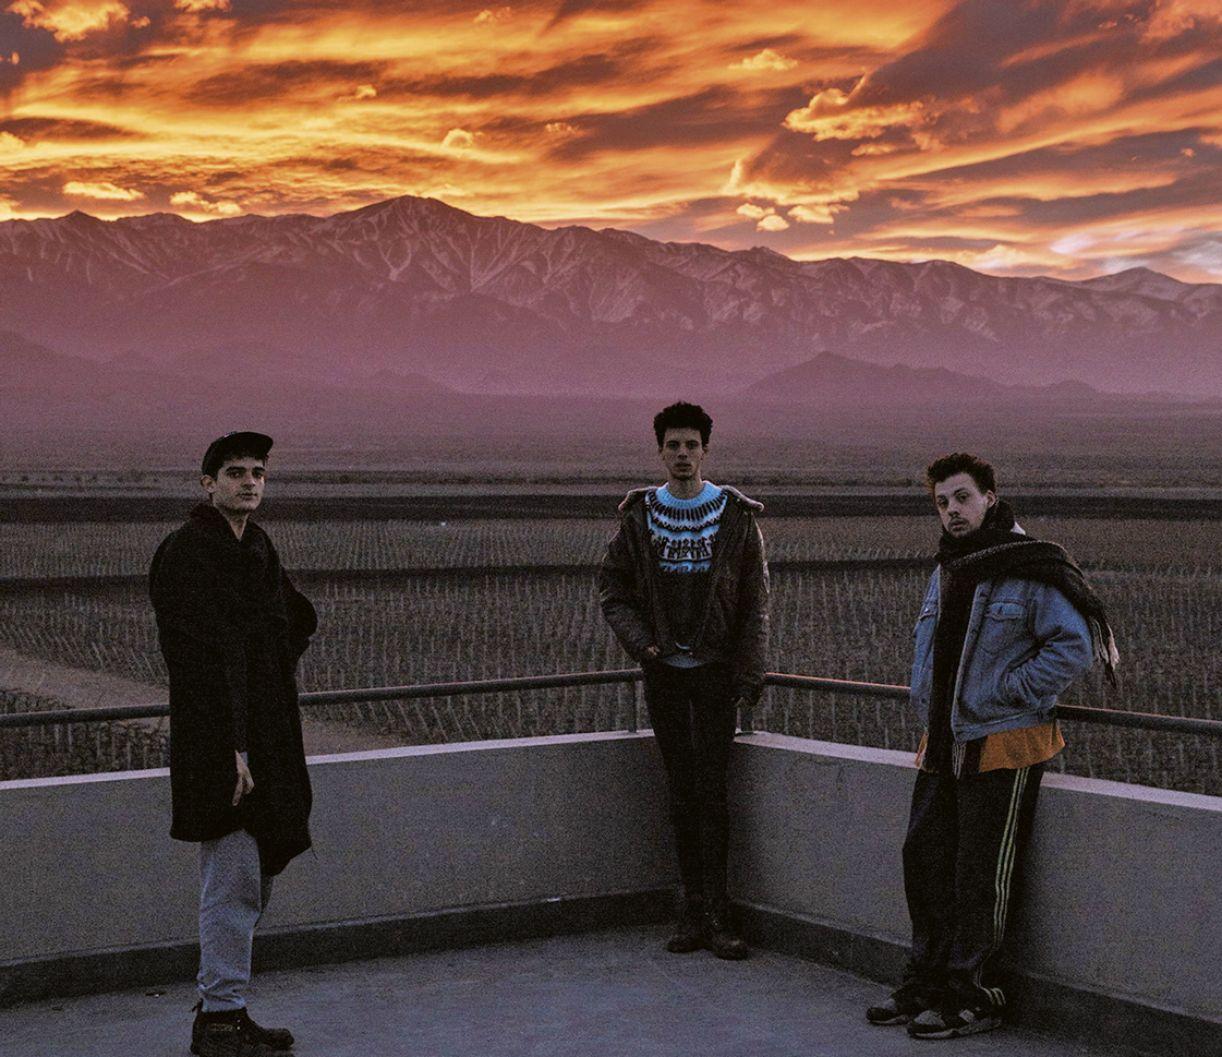 O trio Usted Señalemelo figura na cena musical independente de Mendoza, na Argentina